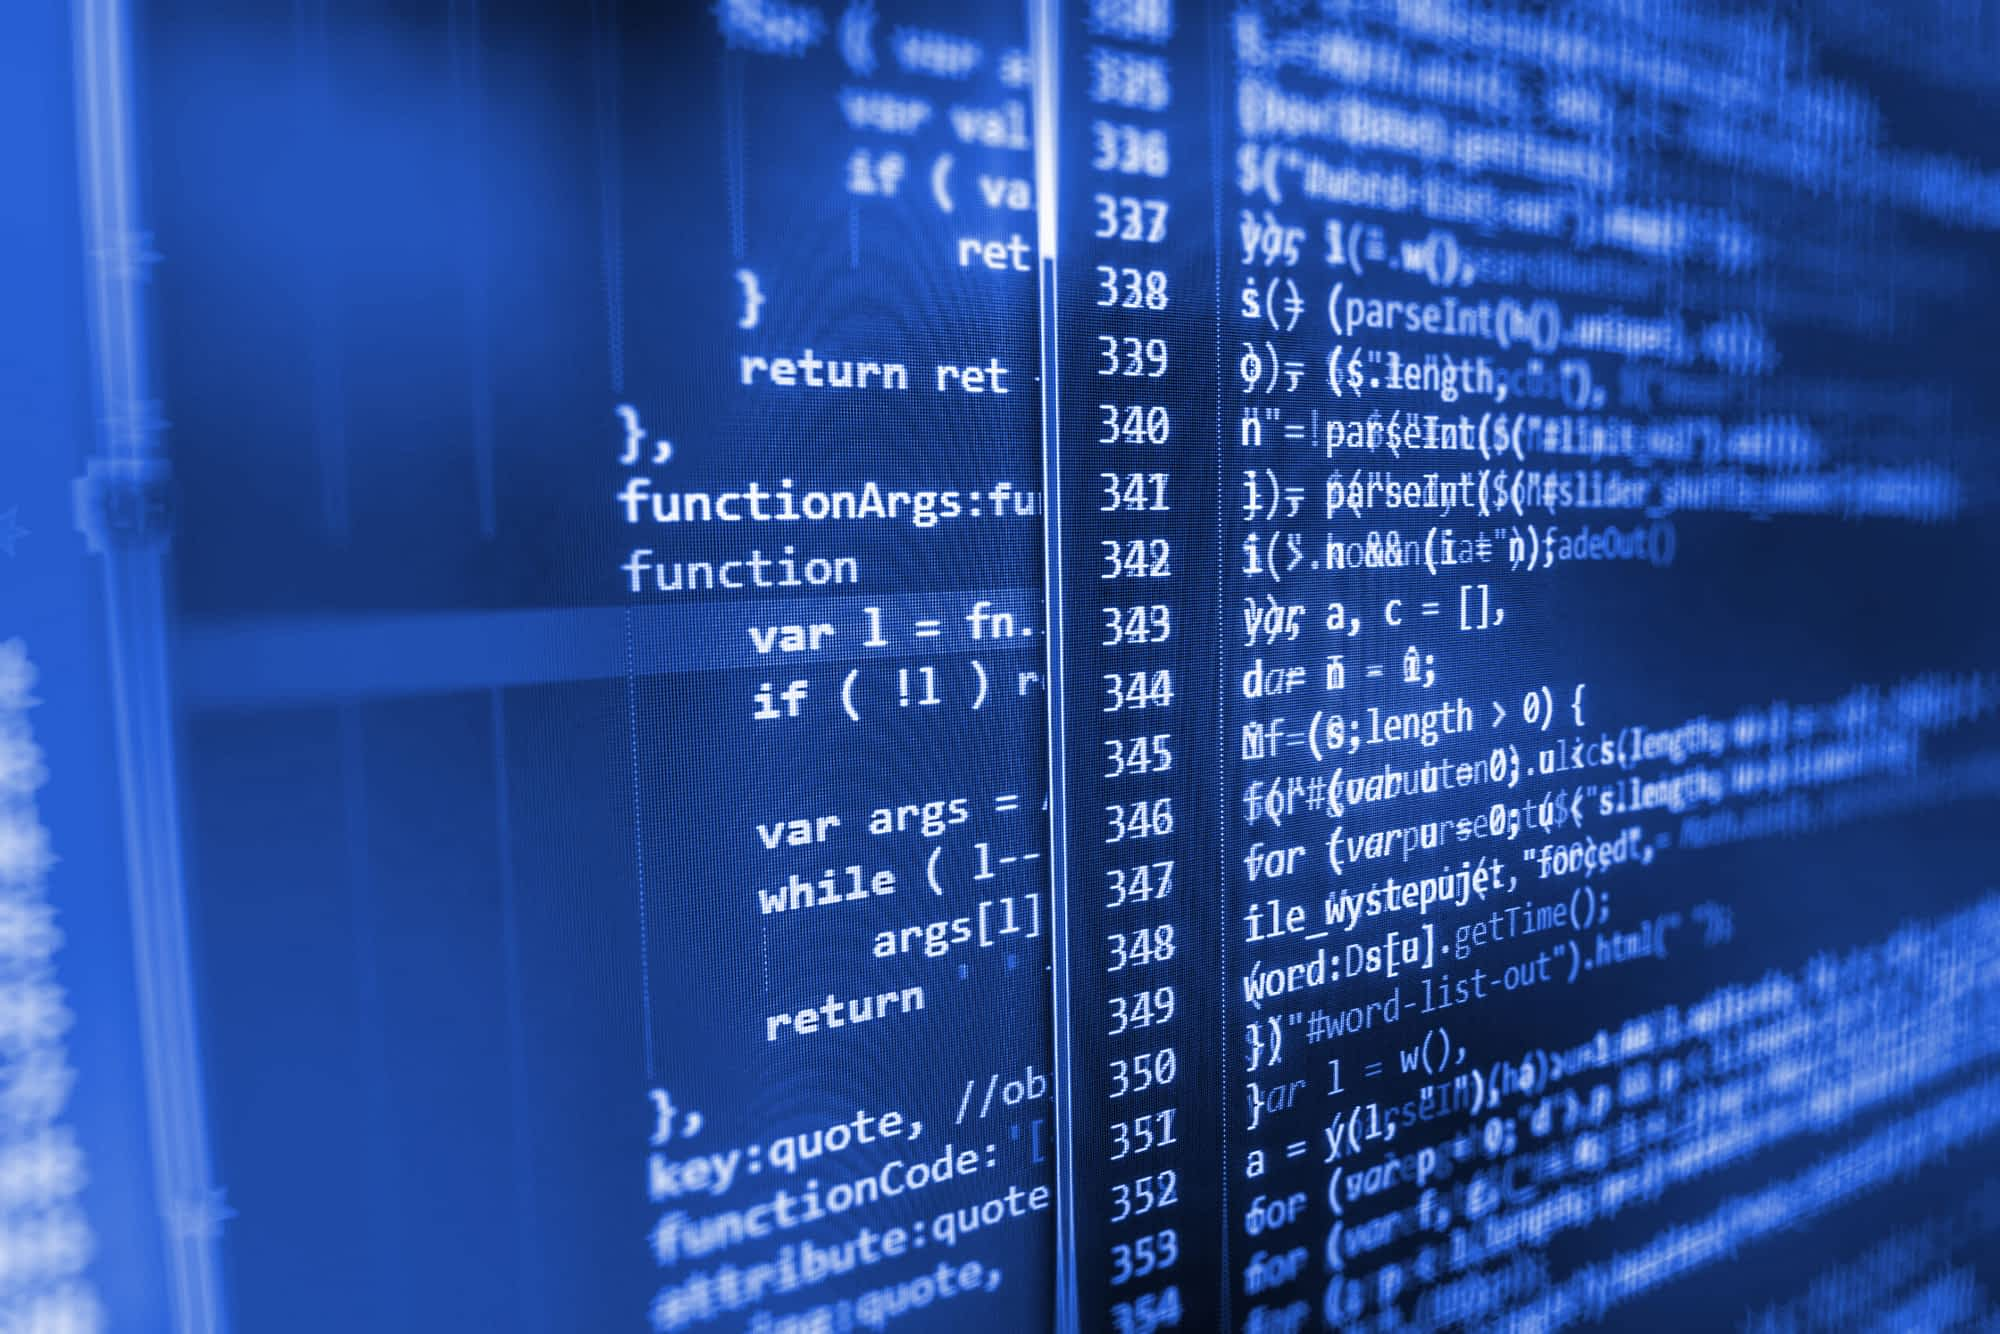 AWTech-home-sviluppo-software